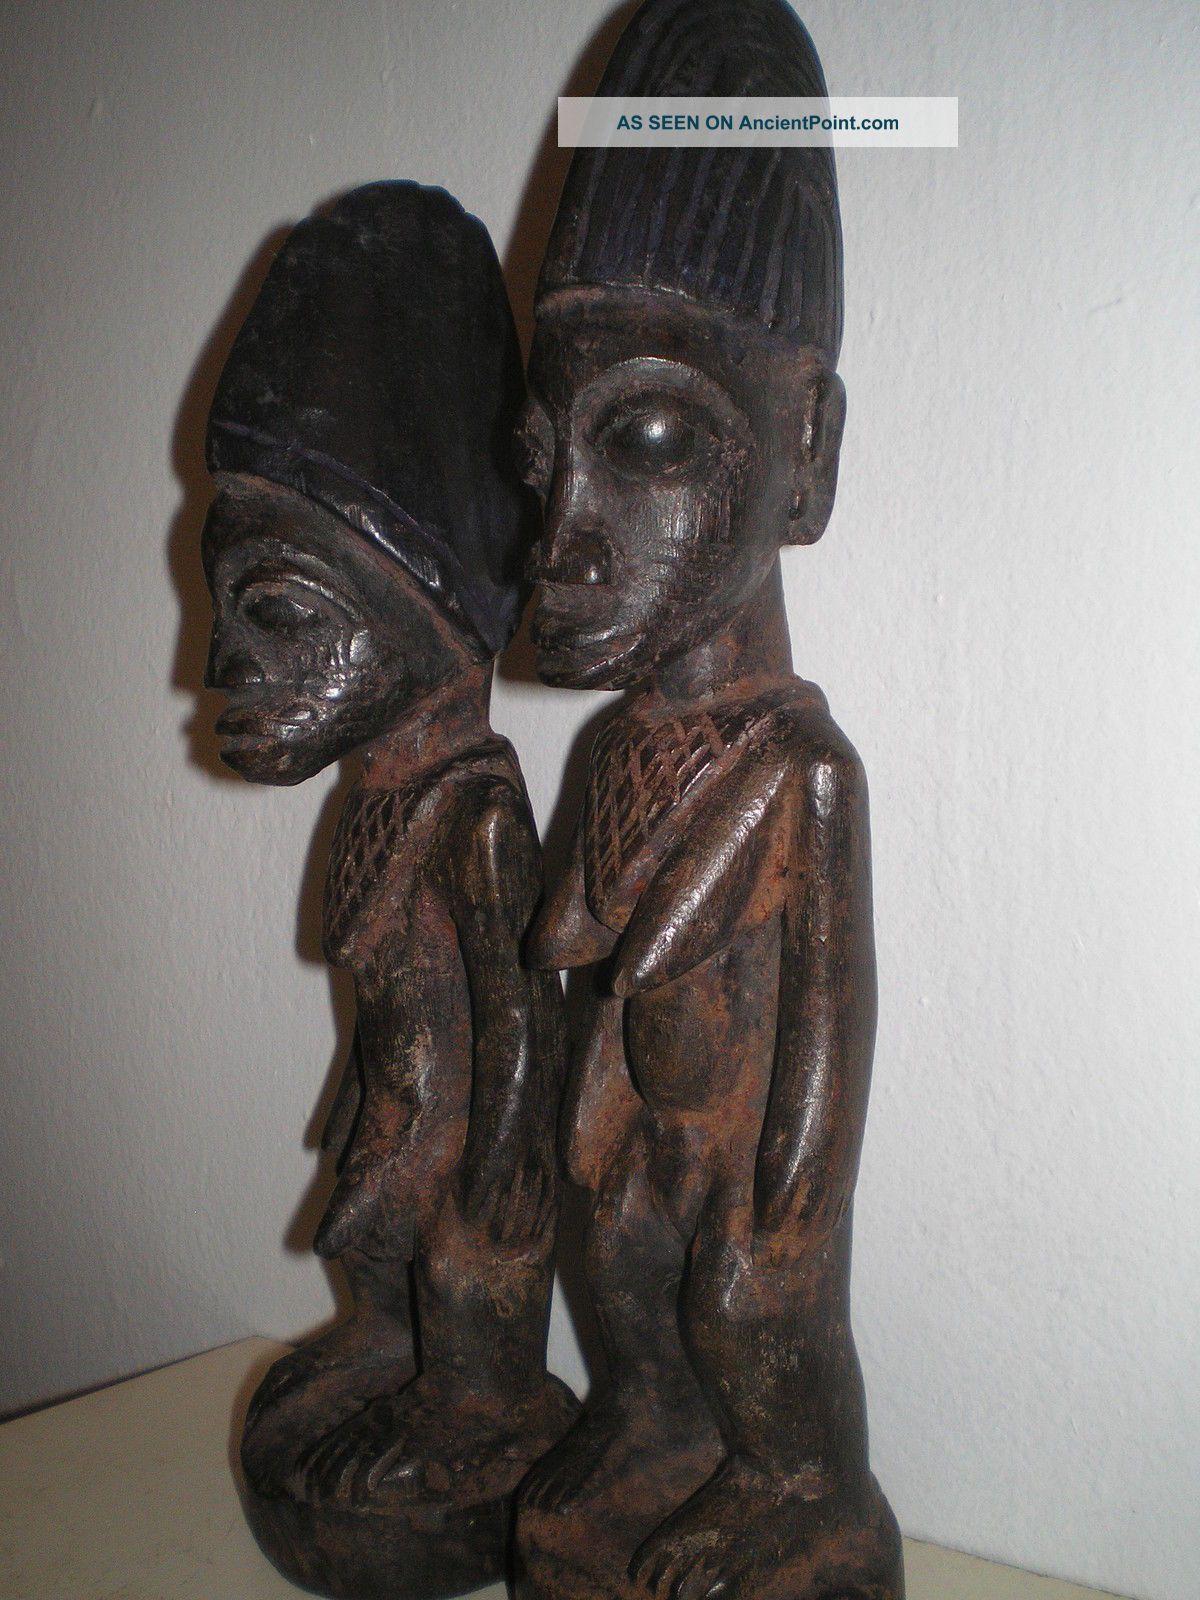 Antique Yoruba Ekiti Ibeji Figures Sculptures & Statues photo